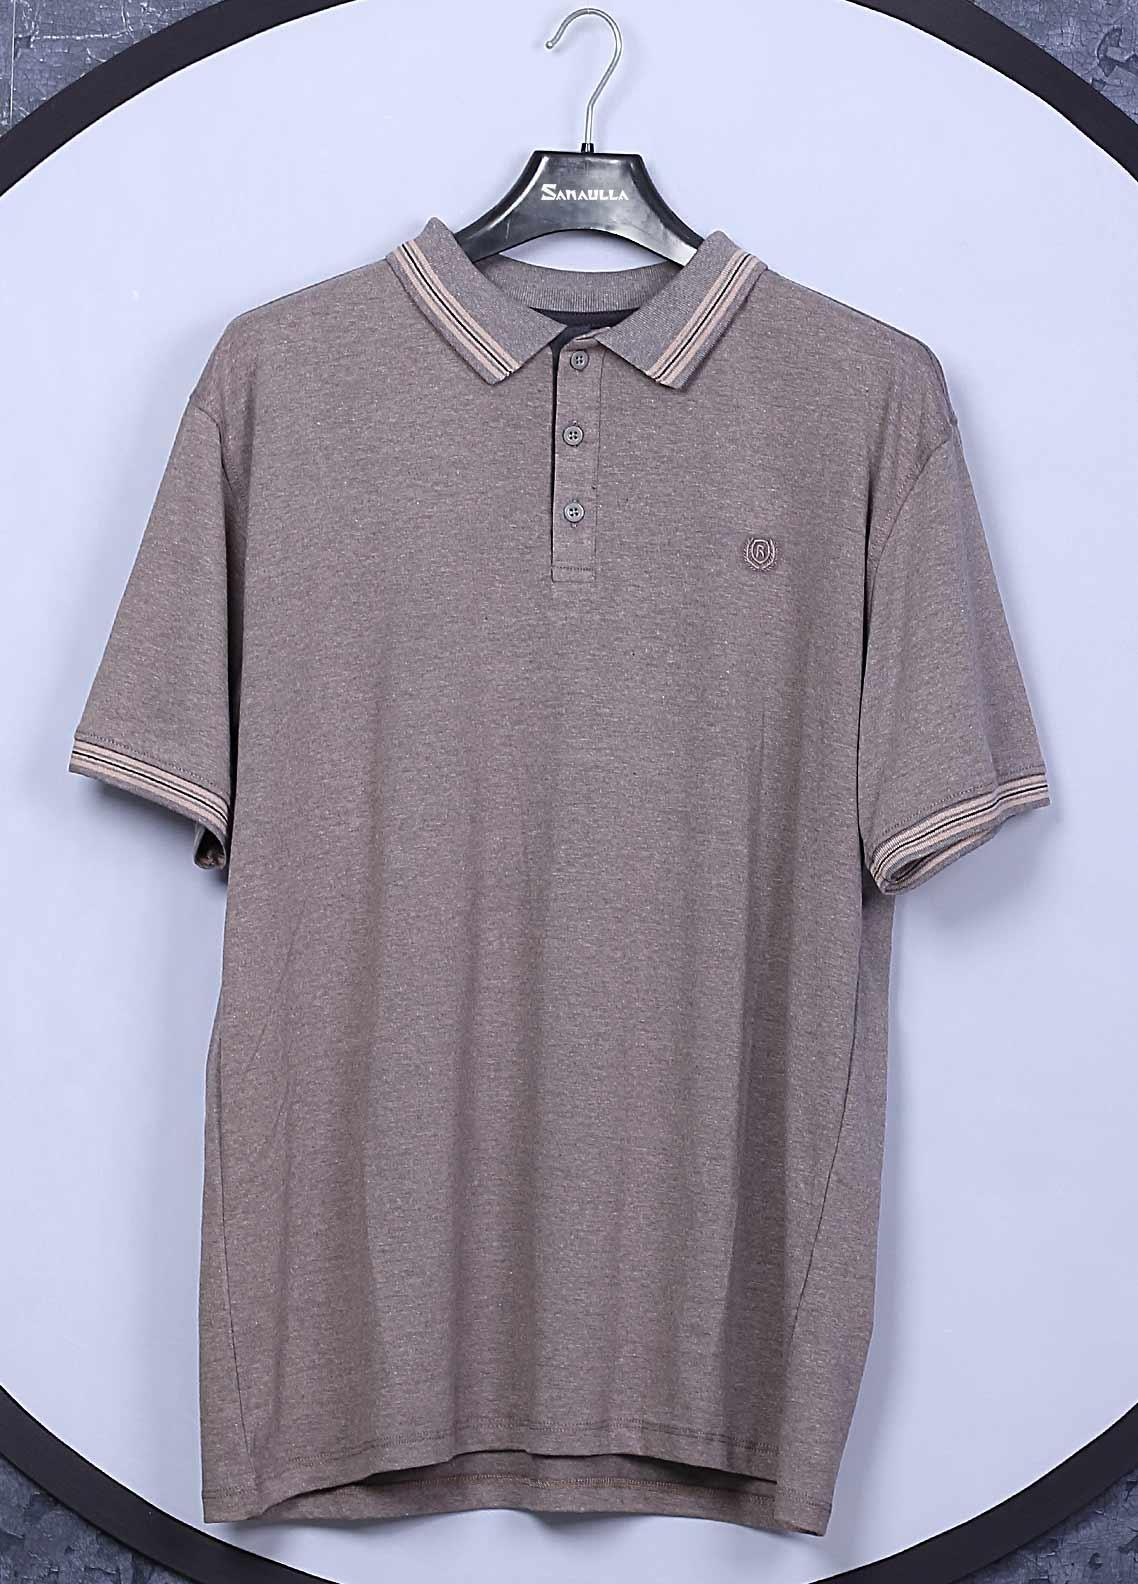 Sanaulla Exclusive Range Cotton Casual Men T-Shirts -  5148 Brown